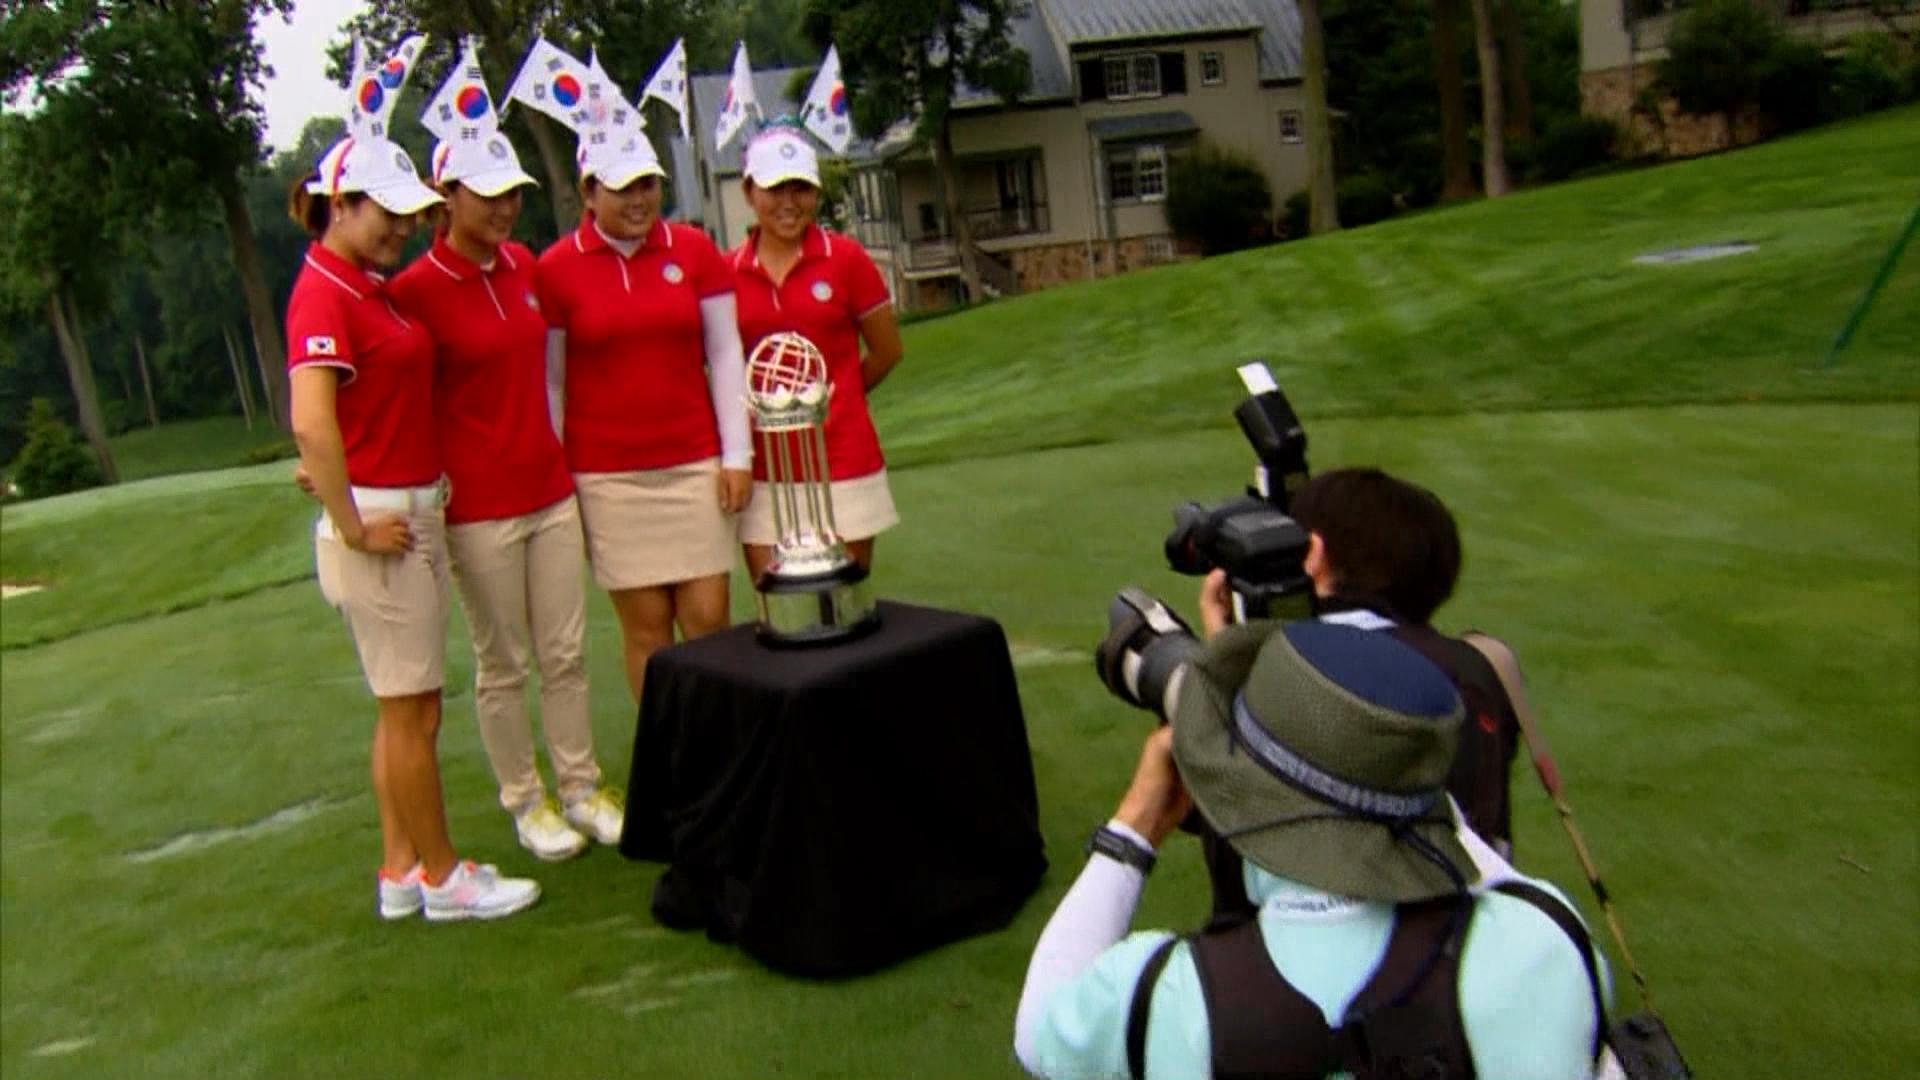 http://www golfchannel com/media?guid=a222ff3d-cb51-4874-8c46